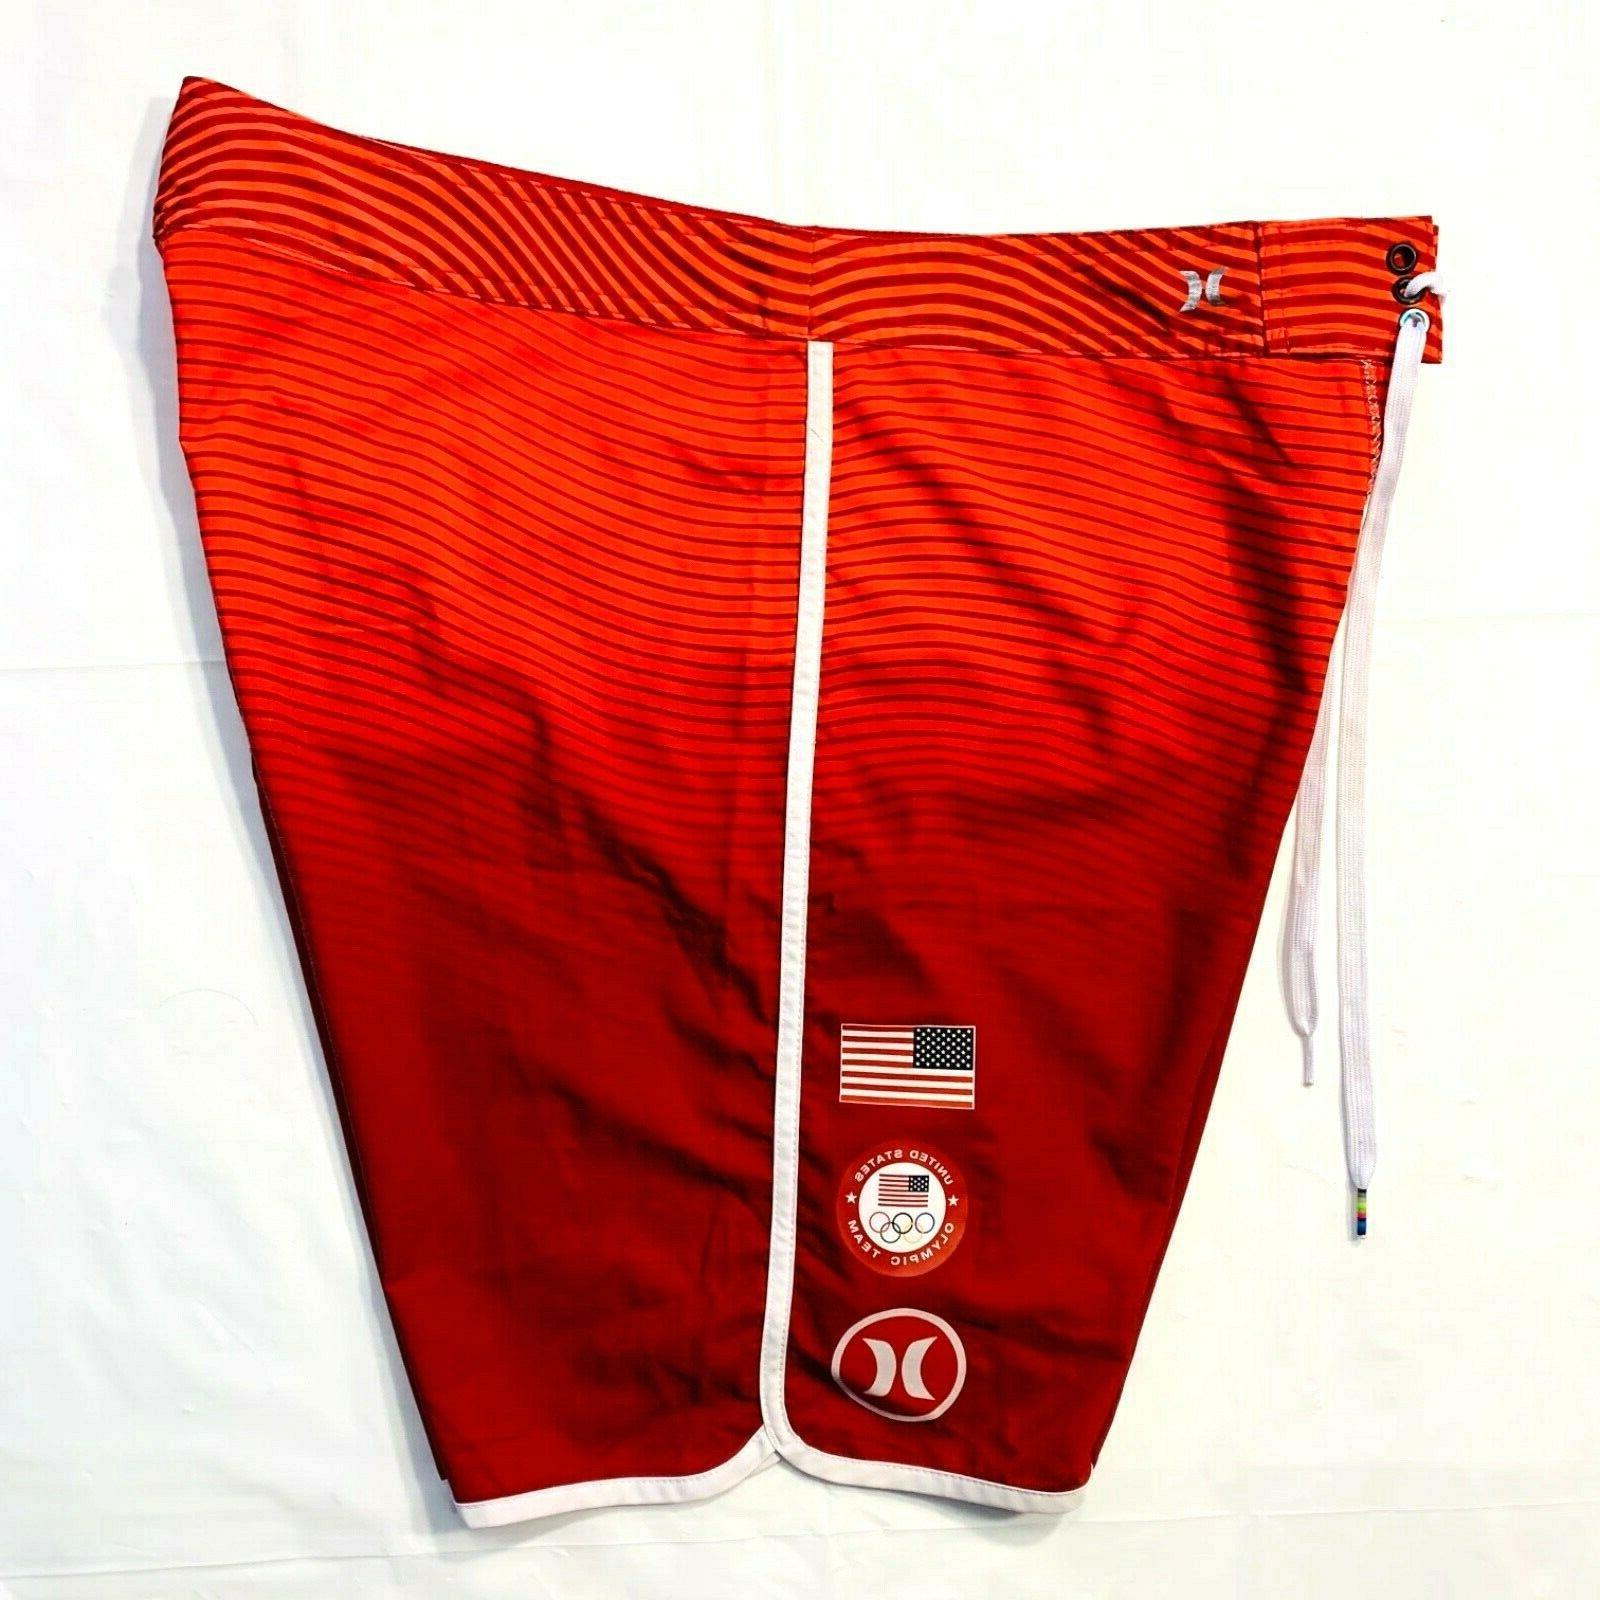 HURLEY Phantom USA Olympic Team Swim Trunks 36 Surfing Red